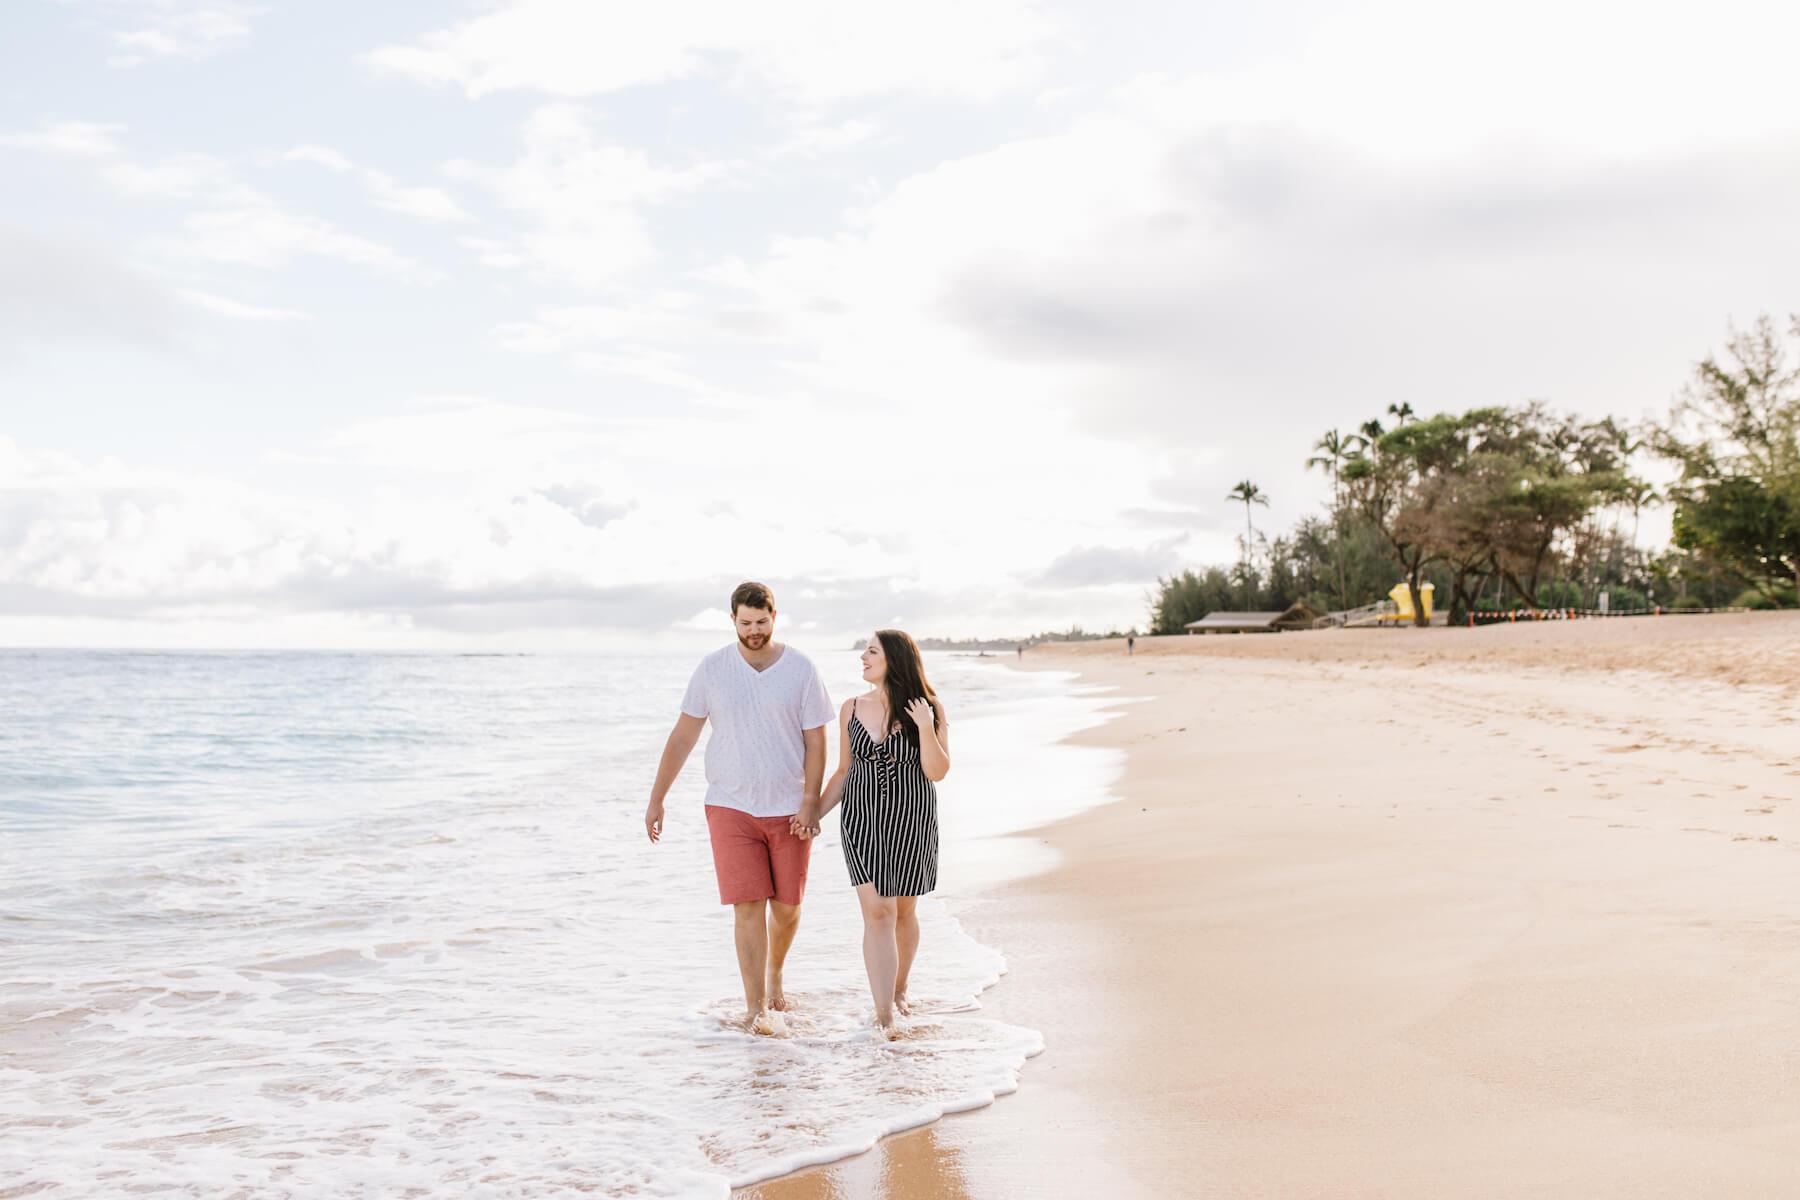 maui-08-28-2019-honeymoon-15_original